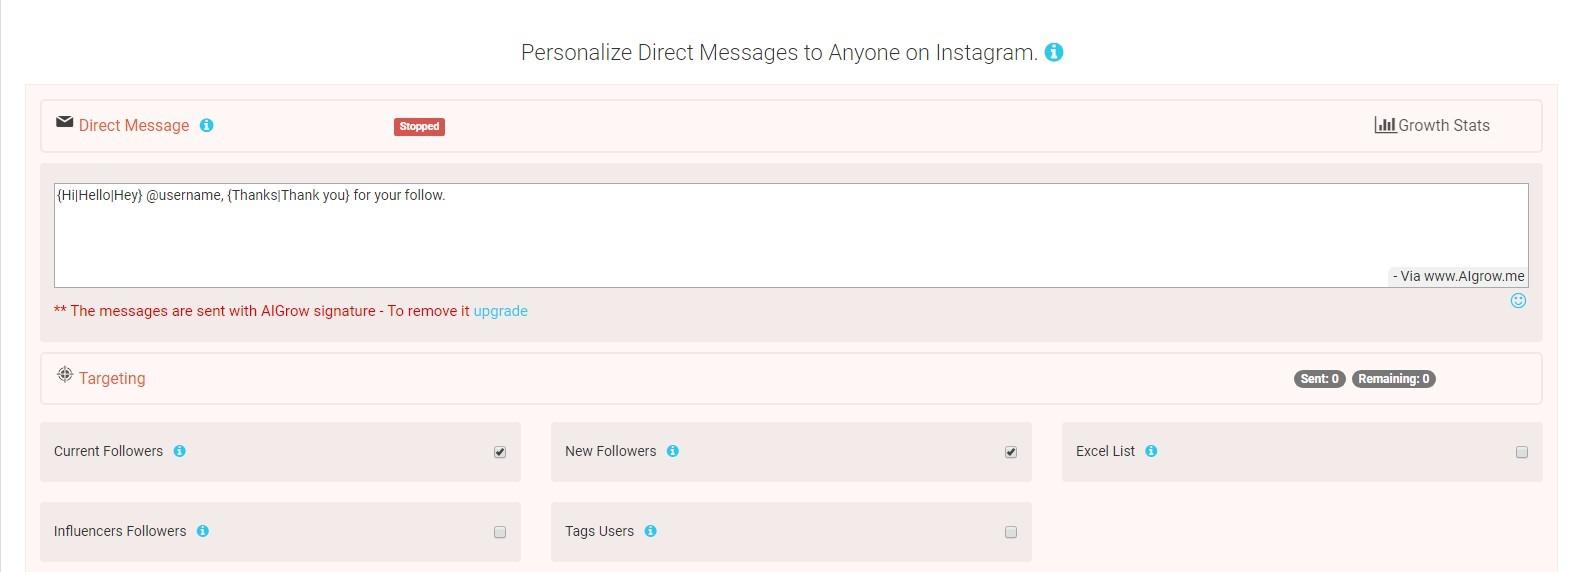 7 Essential Tools Every Instagram Content Creator Needs – Adlibweb